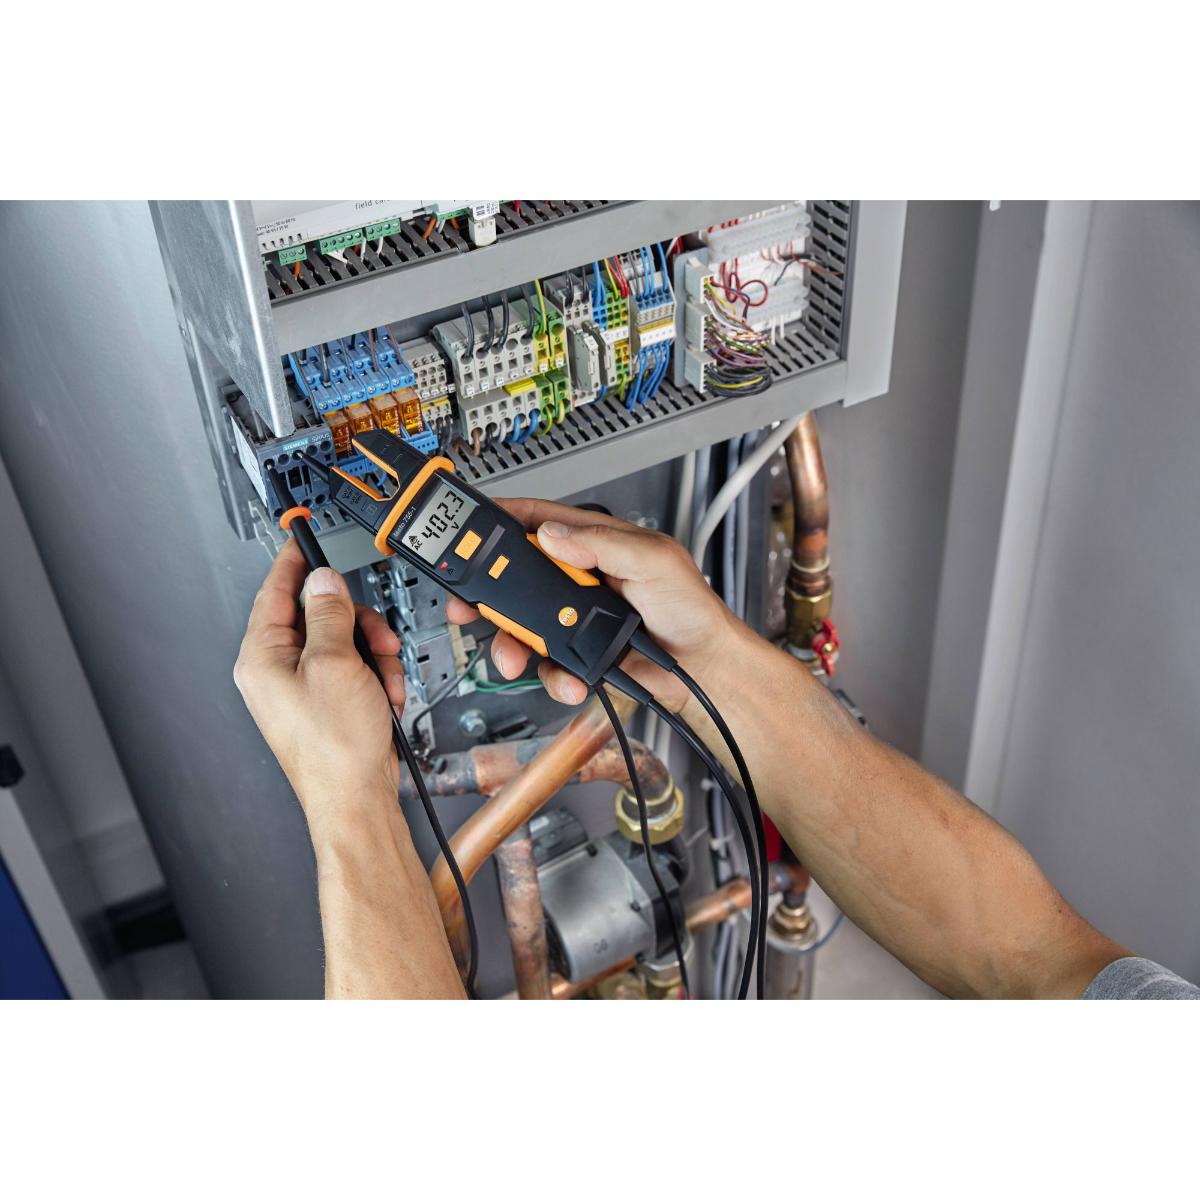 testo 755-1 | Current/Voltage Tester